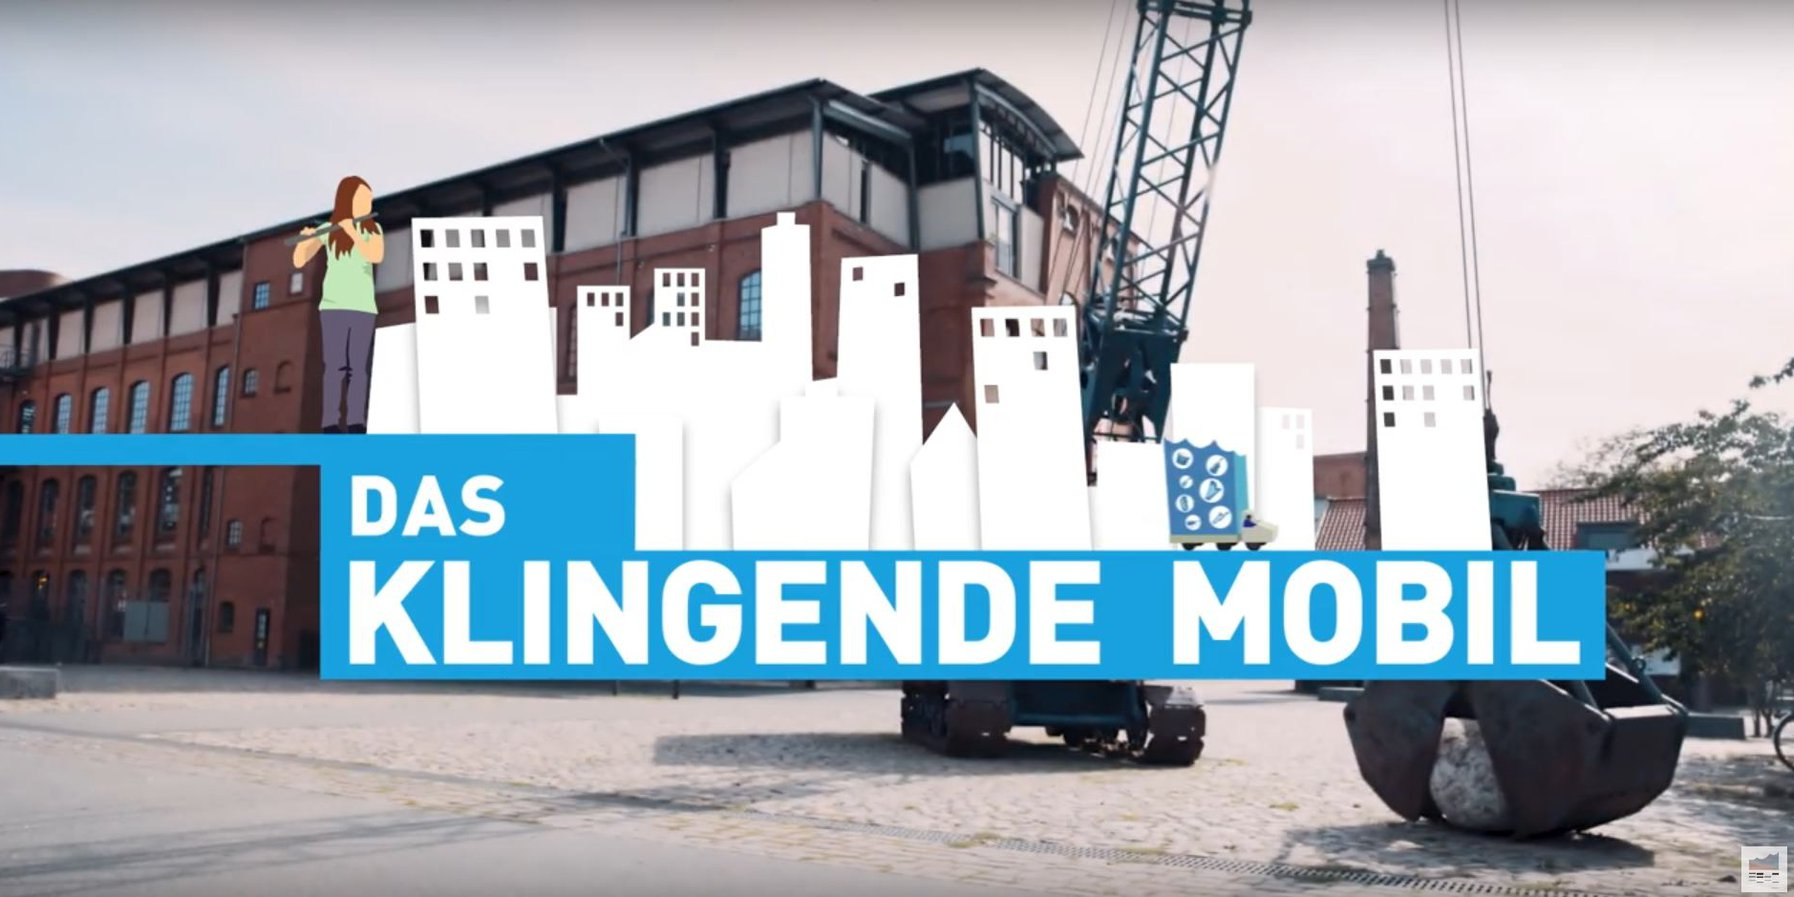 Das Klingende Mobil in den Stadtteilen